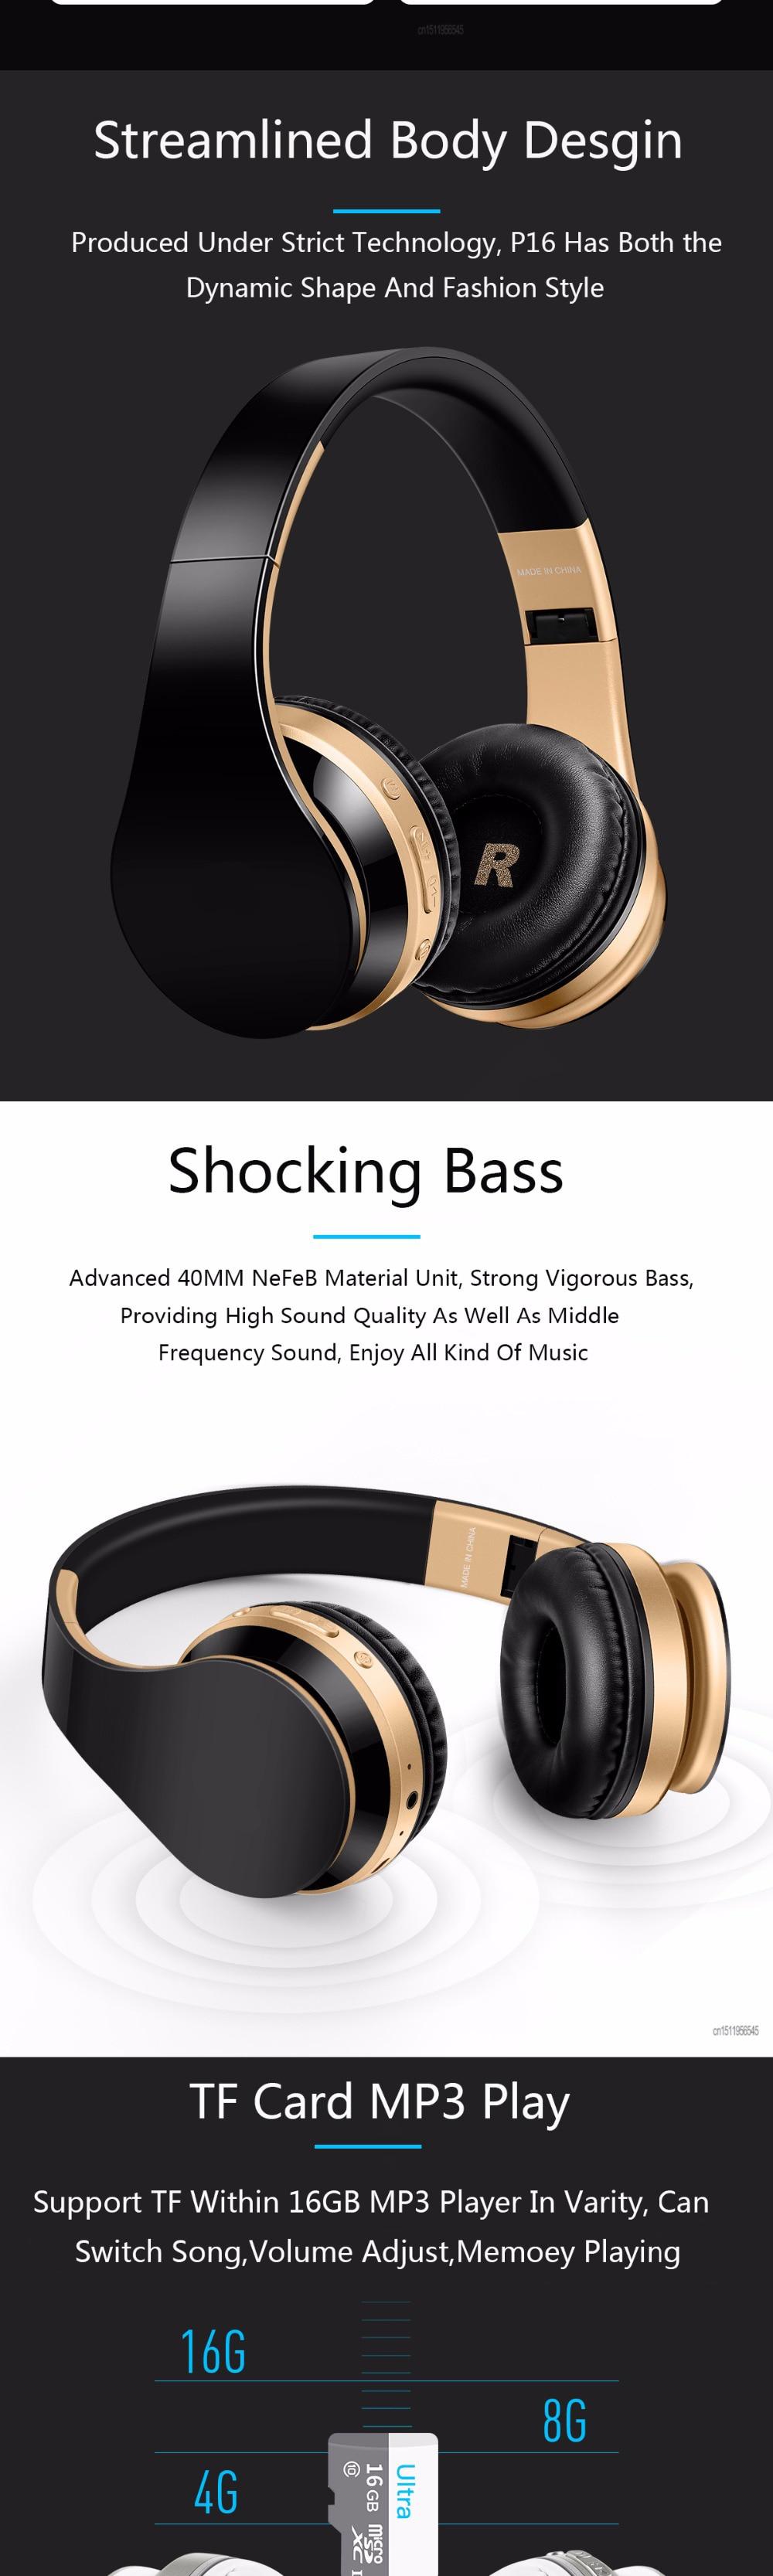 6d1ec1231cd Bluetooth Headphones Wireless Earphones Stereo Bass Headset Earbuds  Foldable Sport Earphone With Microphone MP3 Player. 1 2 3 ...